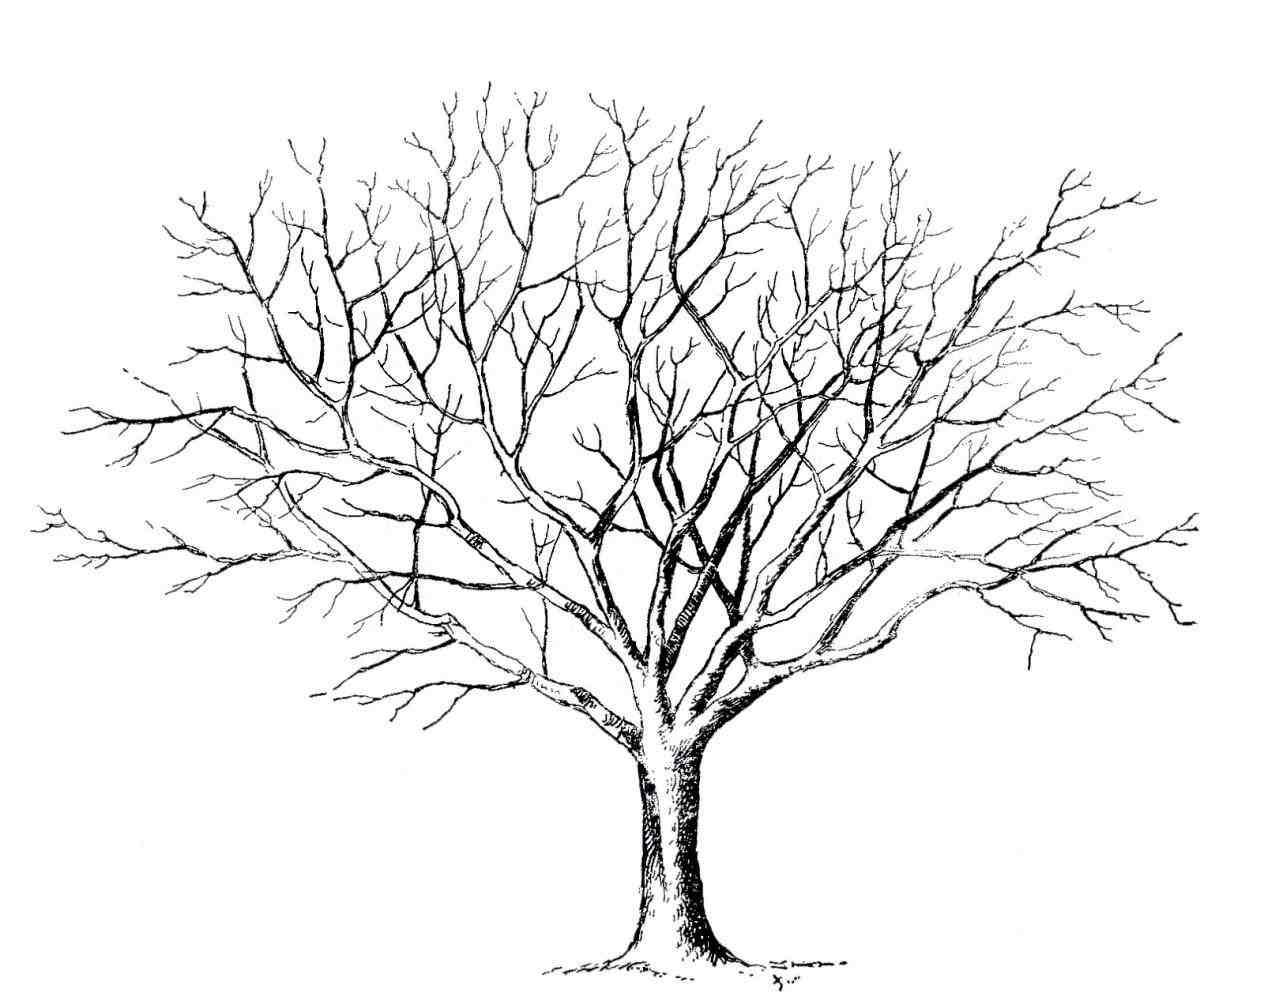 Pear Tree Drawing At GetDrawings.com